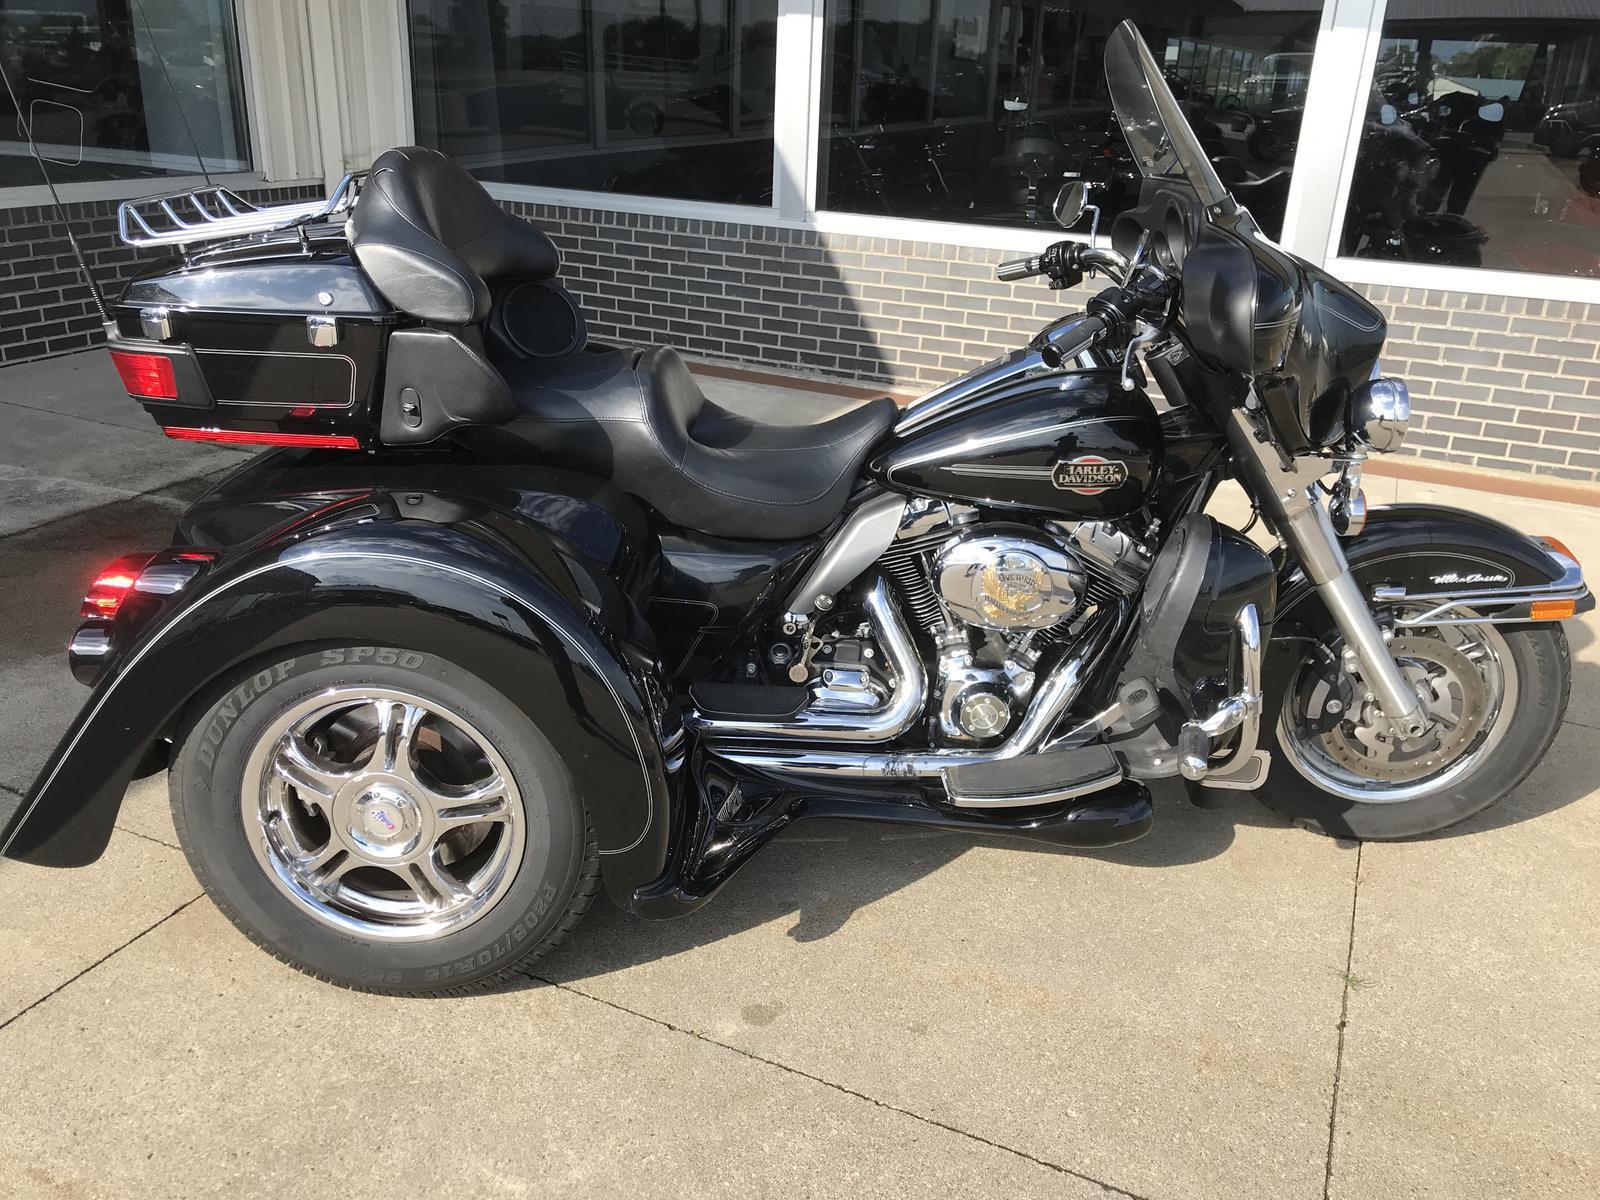 Trike From Frankenstein Trike Kit And Harley Davidson C C Custom Cycle Chariton Ia 641 774 7494